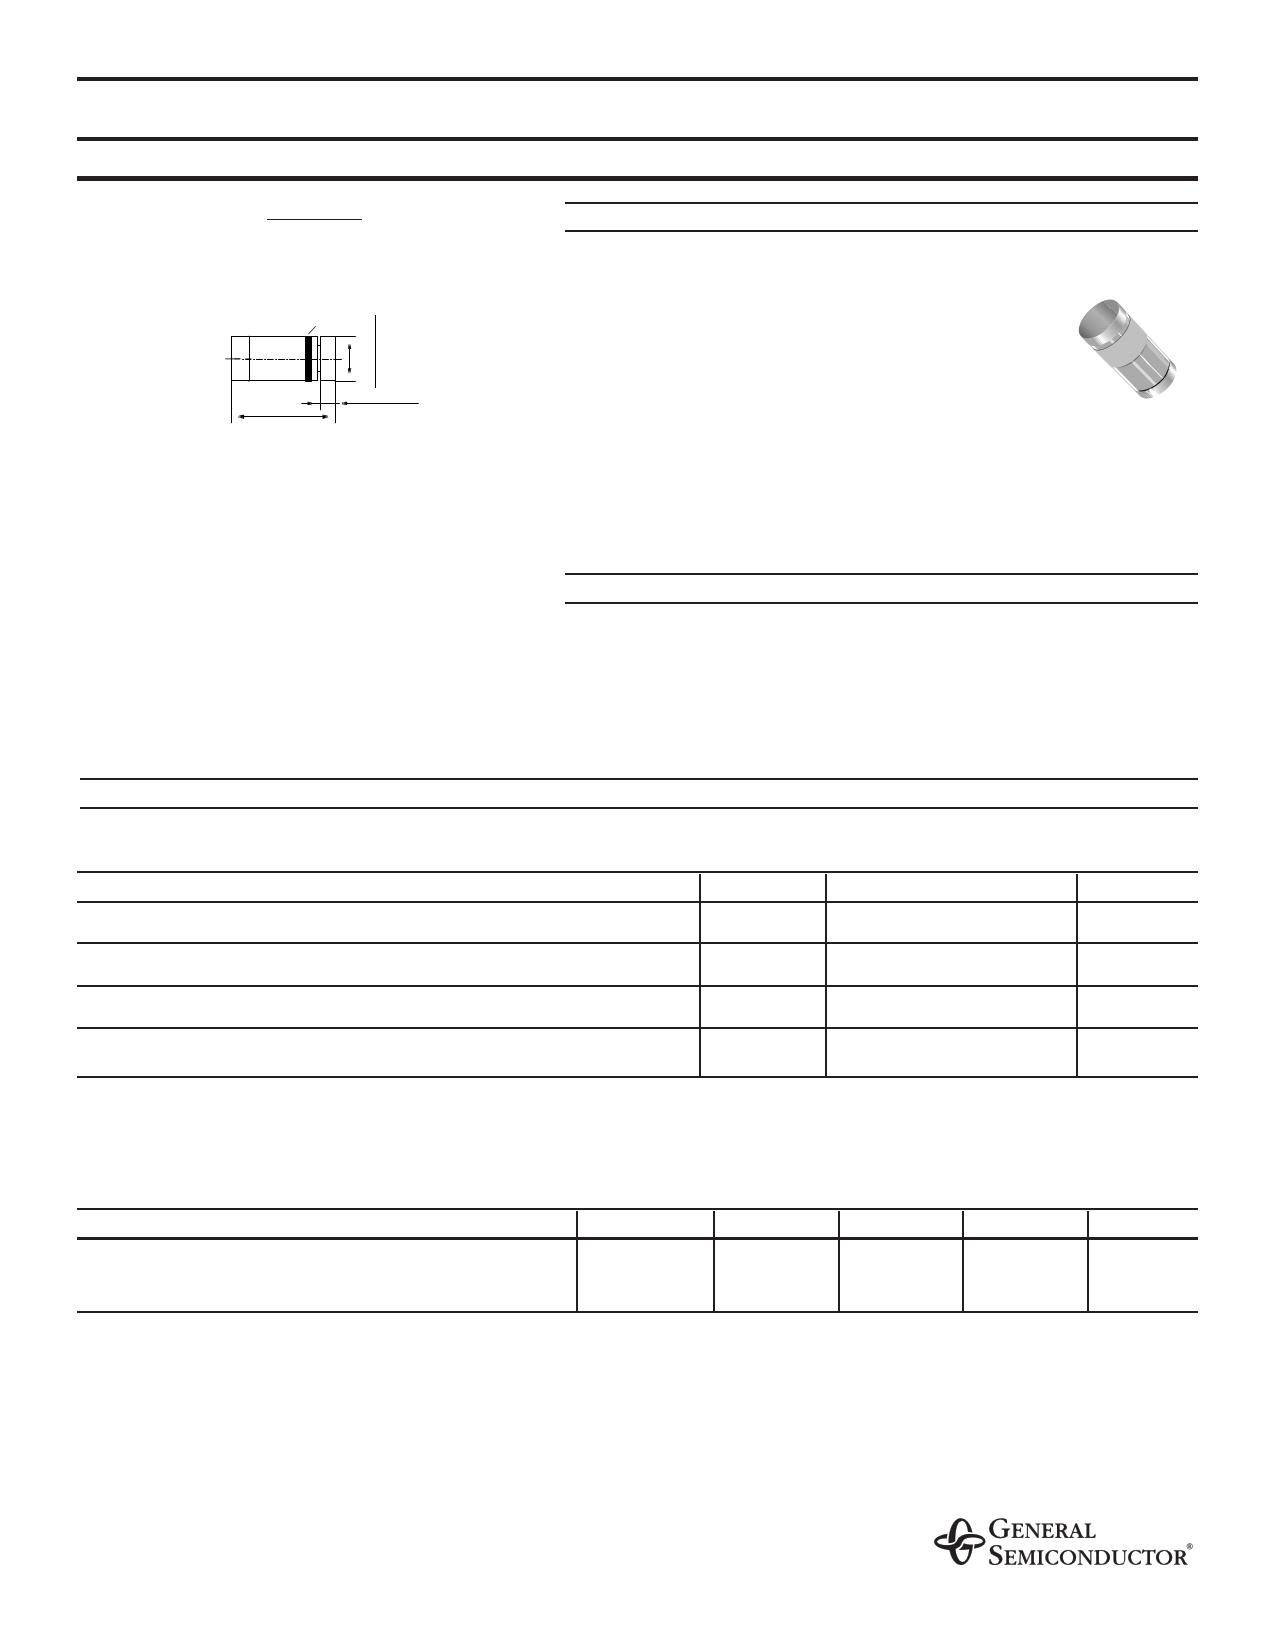 ZMM51 datasheet